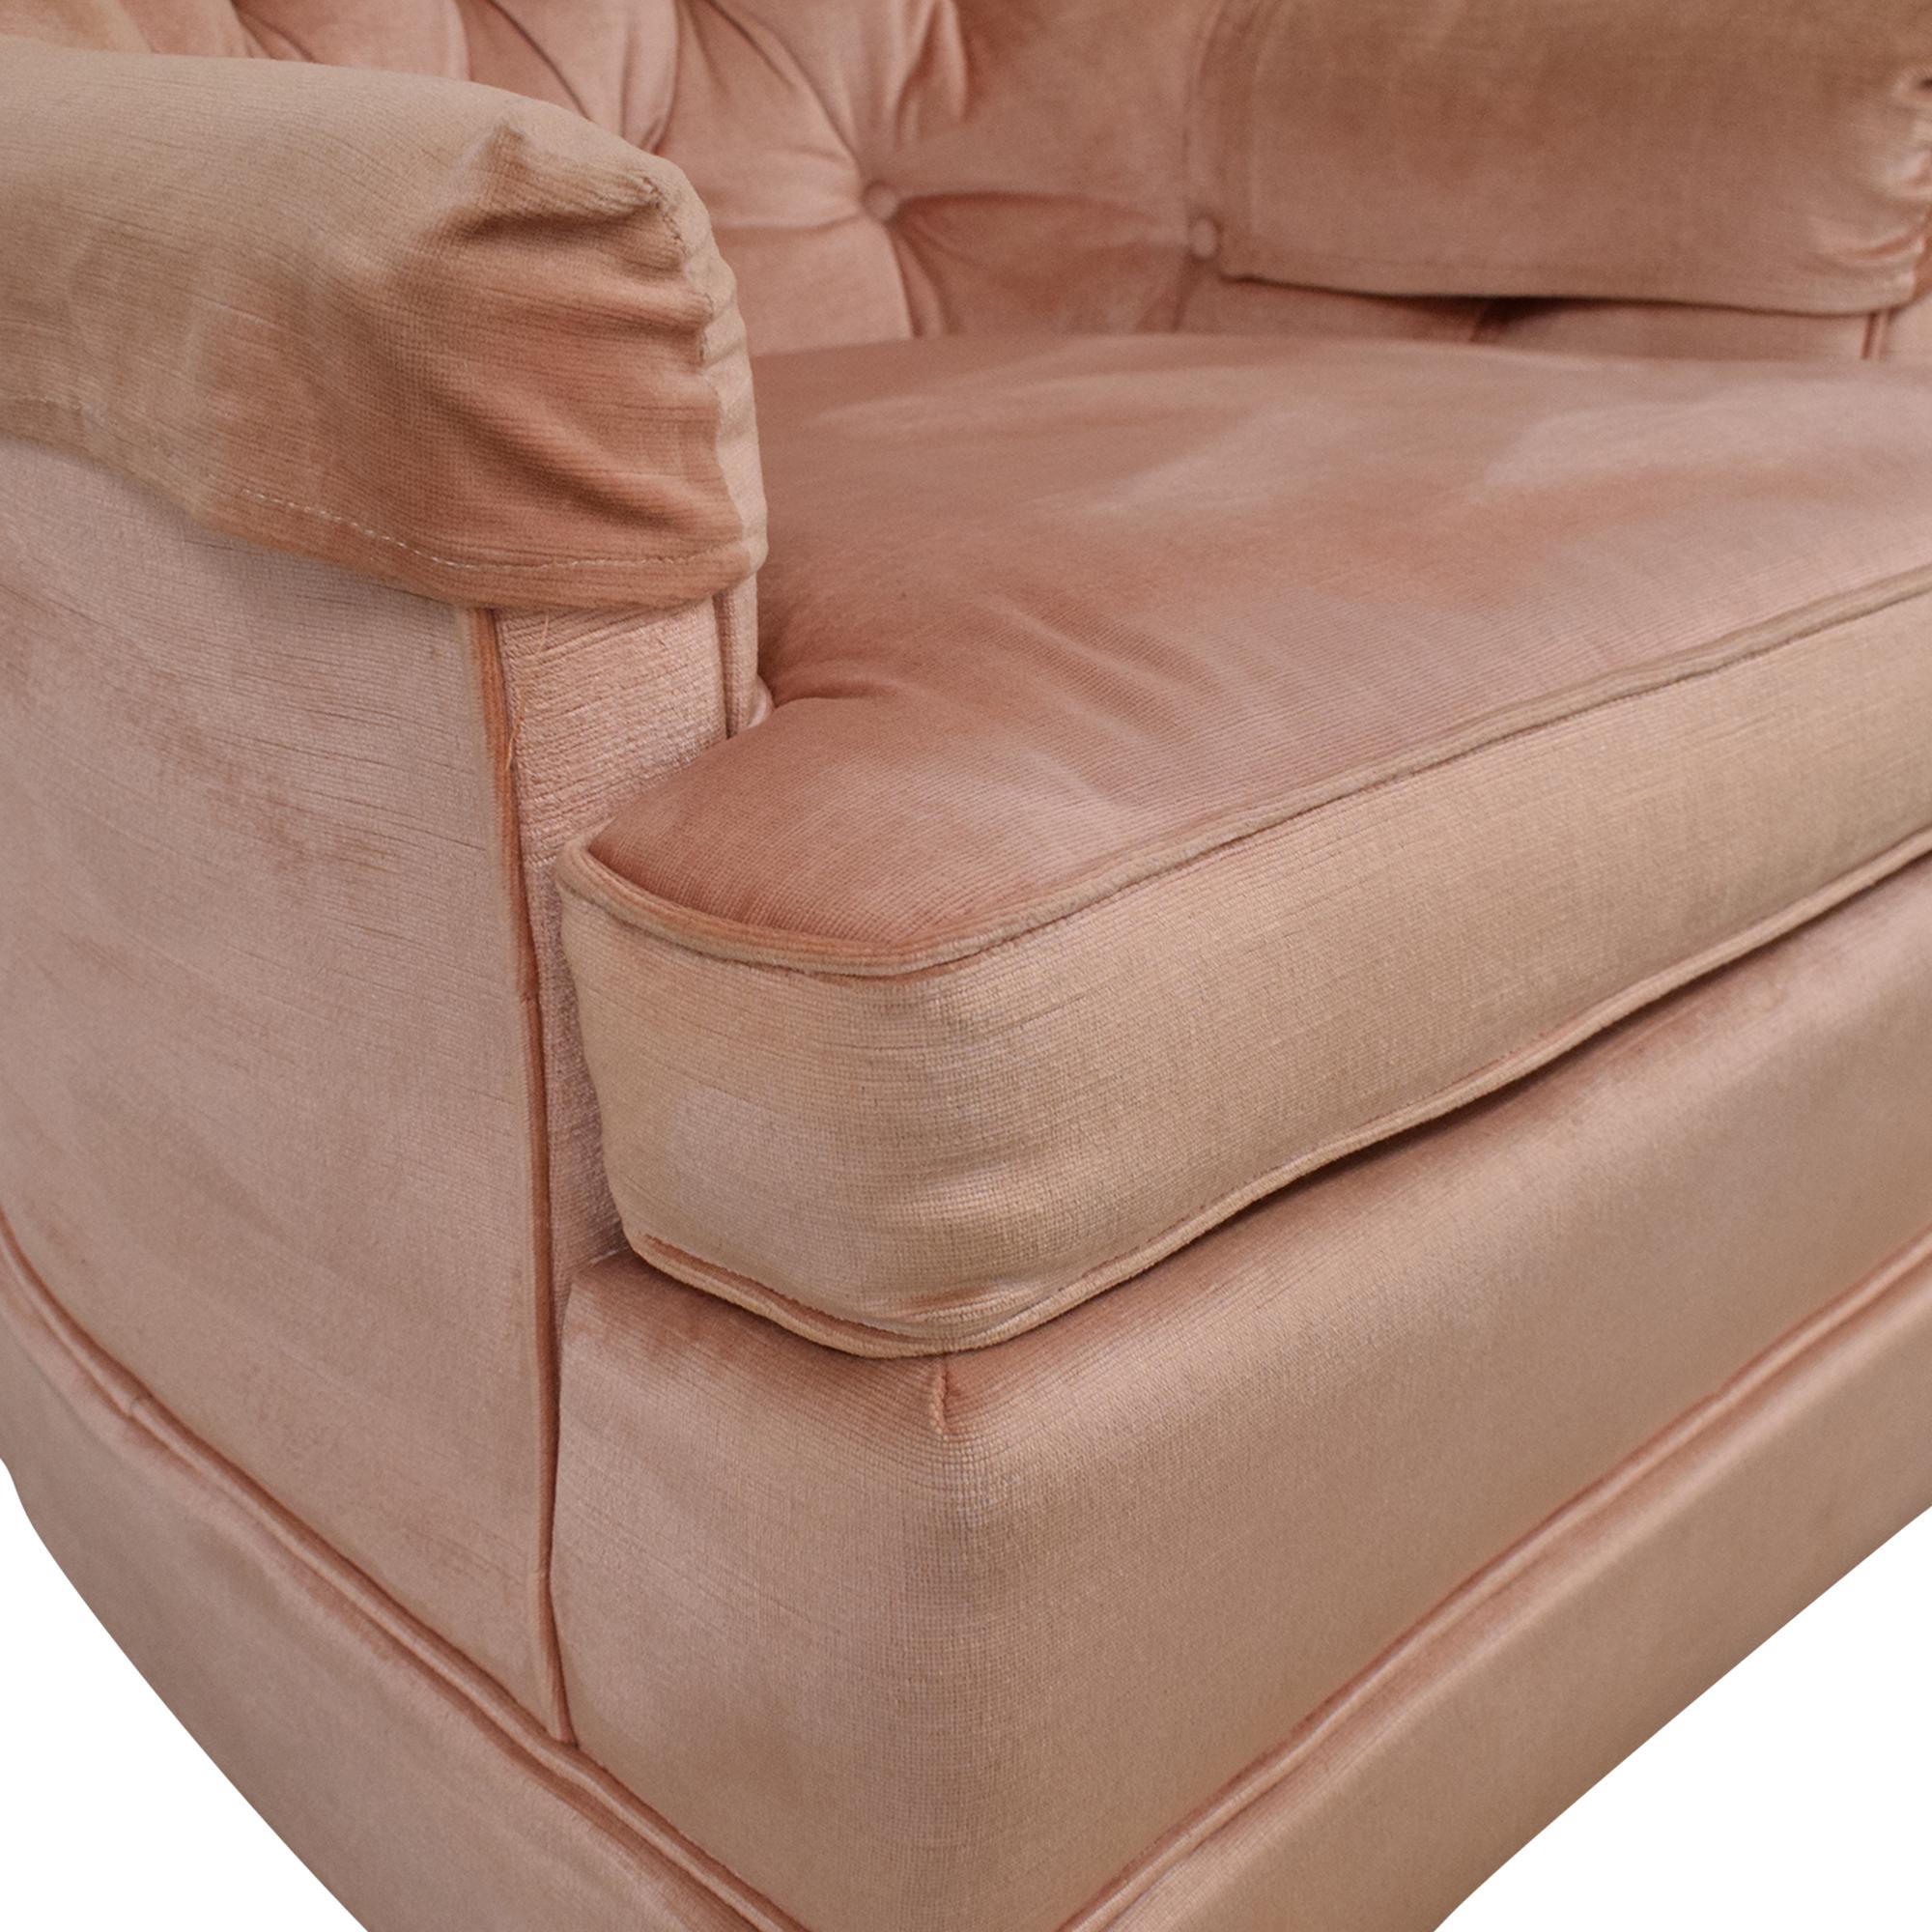 shop Drexel Heritage Drexel Heritage Skirted Club Chair online